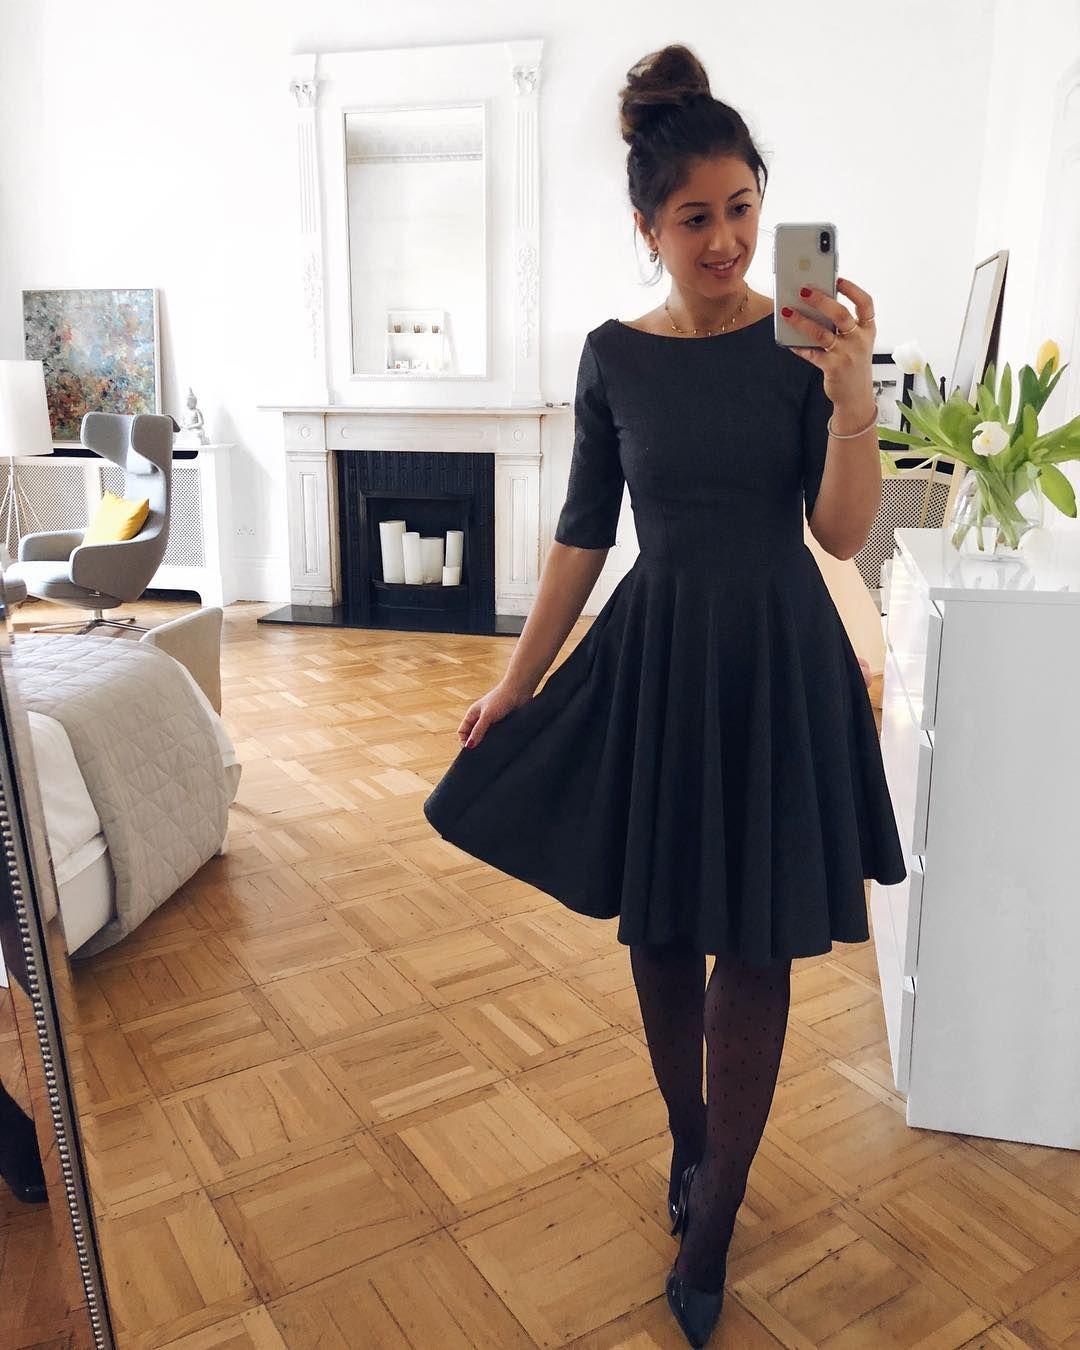 Mimi Ikonn Dark Grey Midi Dress Polka Dot Tights Black Melissa Heels Messy Bun Ootd Style Fashionblog Casual Skirt Outfits Everyday Dresses Fashion [ 1350 x 1080 Pixel ]